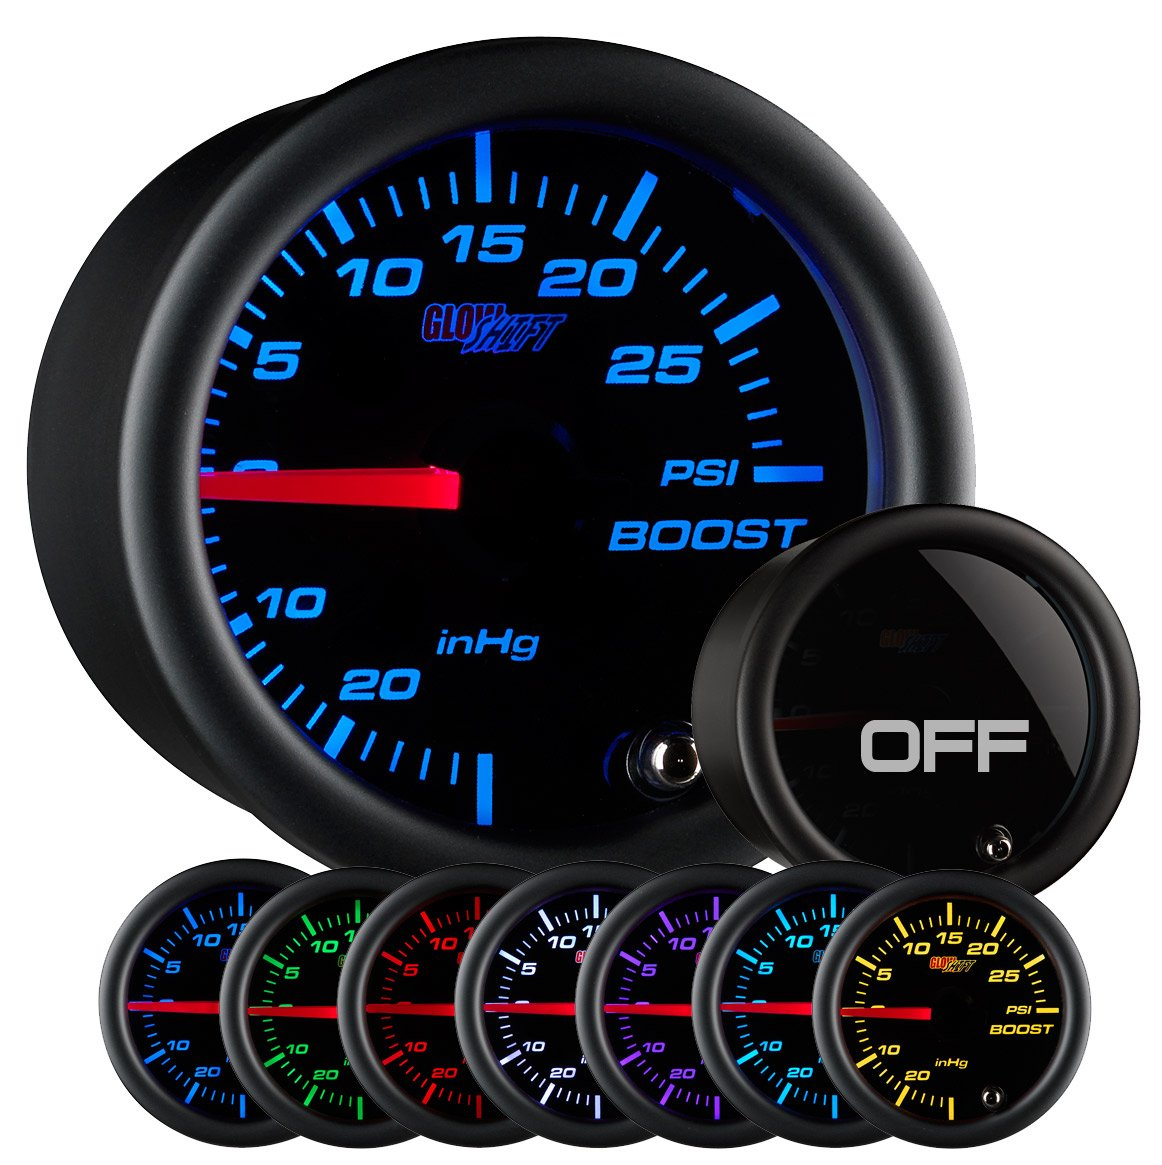 GlowShift 52mm Tinted 7 Color 0-30 inHg/0-30 PSI Boost/Vacuum Gauge for Car Truck - 7 Color LED Backlighting - Black Face - Tinted Lens